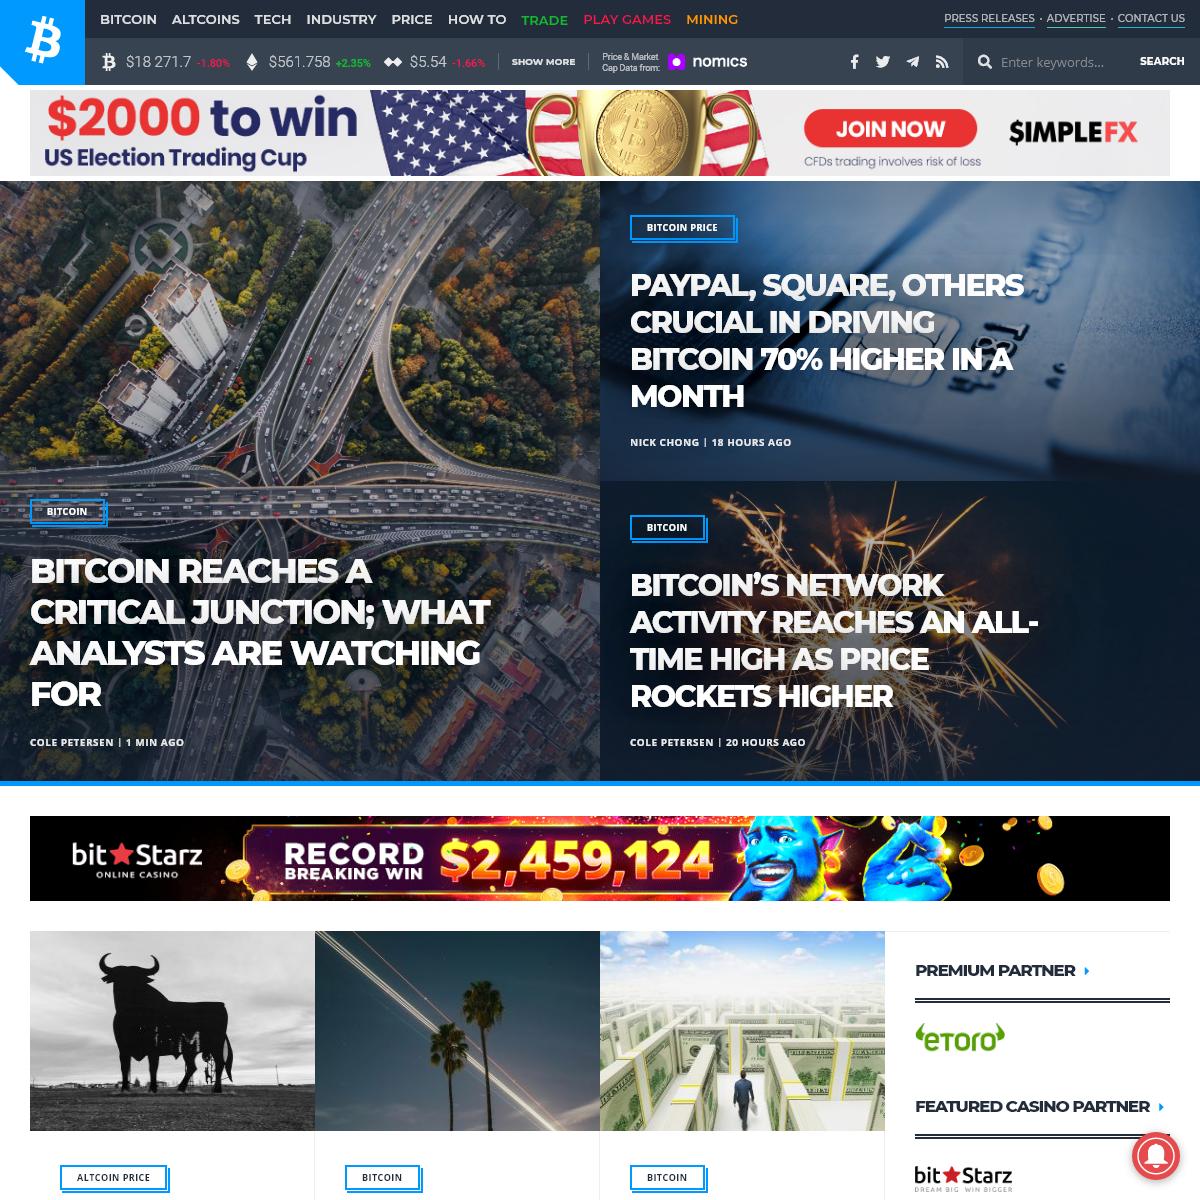 Bitcoin News, Recent Updates, Price and Analysis – Bitcoinist